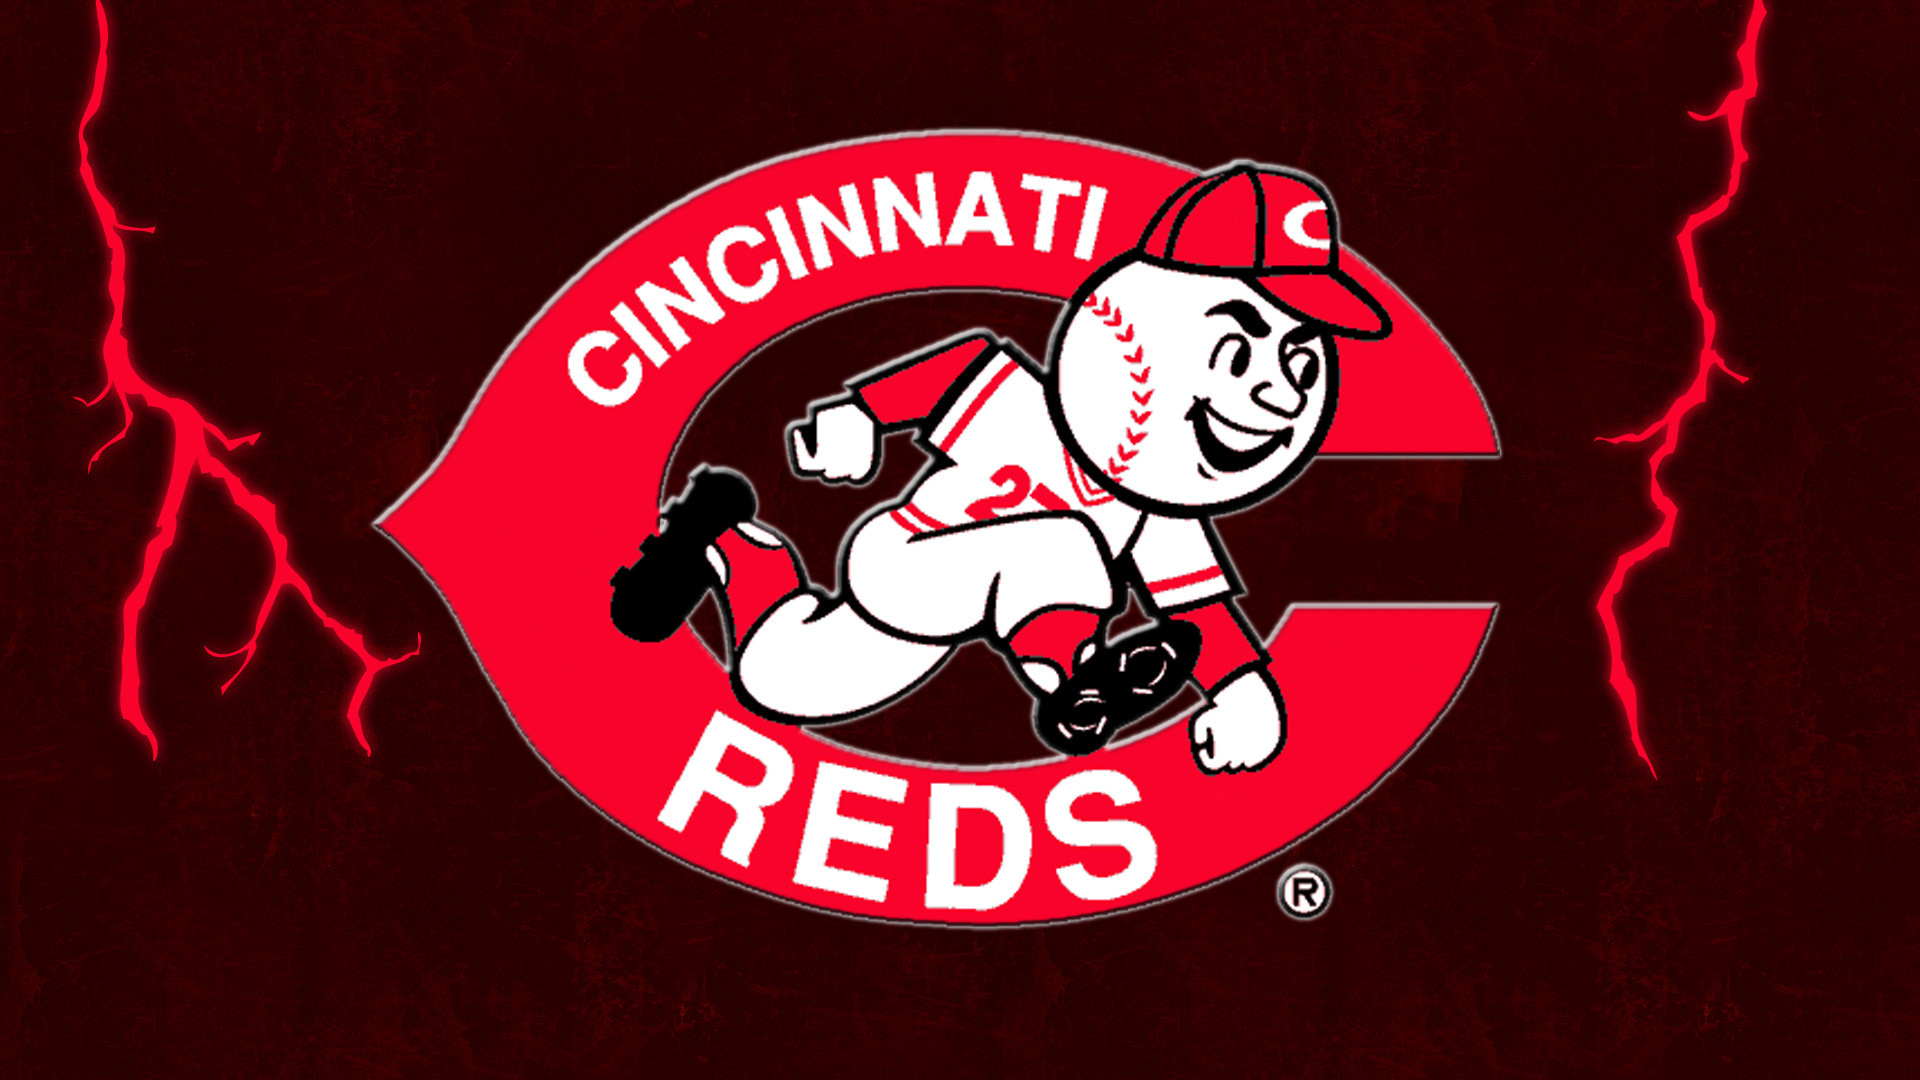 1920x1080 CINCINNATI REDS Mlb Baseball (7) Wallpaper | 1920x1080 | 229502 .